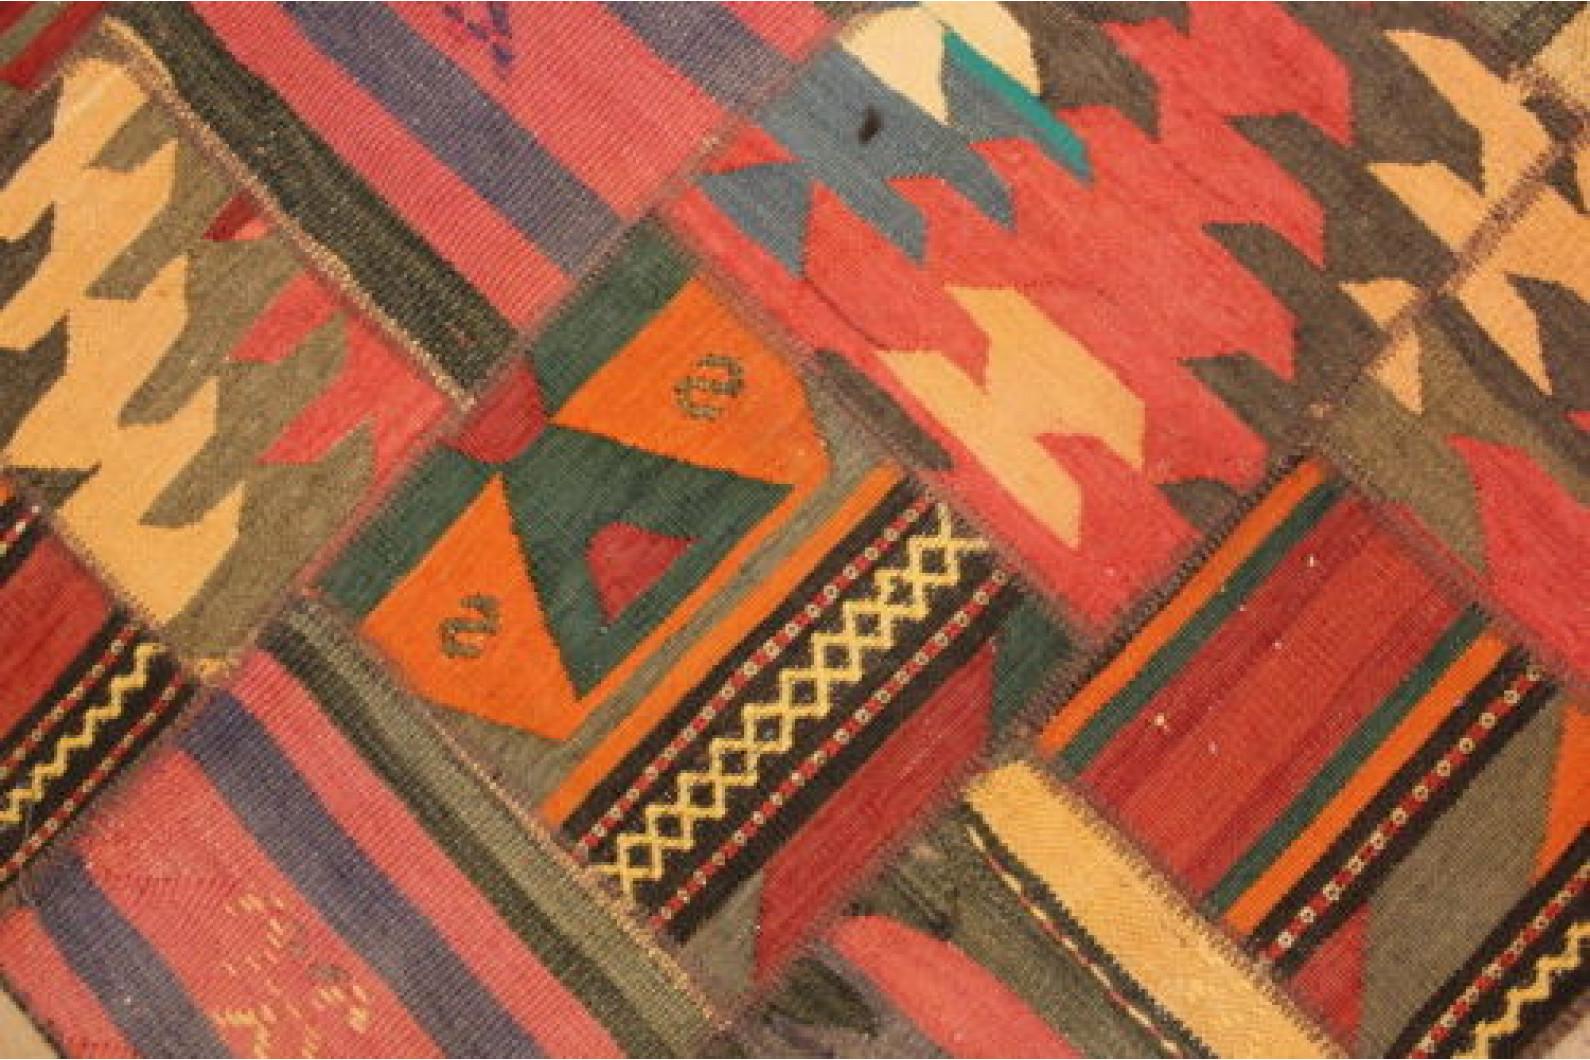 kelim patchwork teppich braun rot in 200x150cm 1001 6688. Black Bedroom Furniture Sets. Home Design Ideas